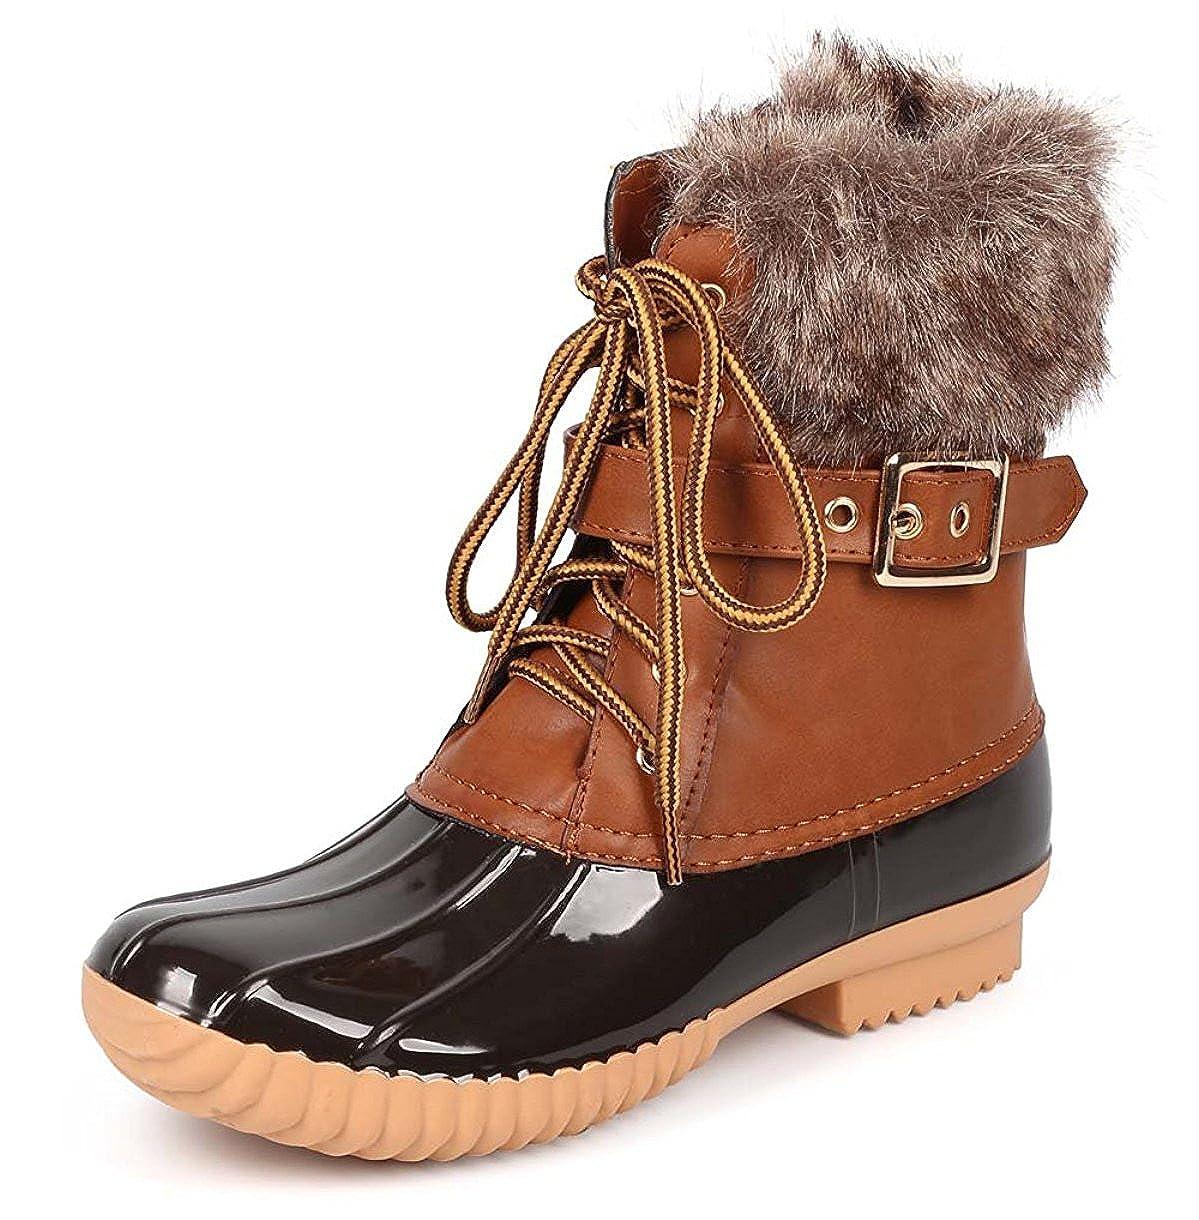 e44d3ee8c6e48 Amazon.com | Nature Breeze Duck-01 Women's Chic Lace Up Buckled Duck  Waterproof Snow Boots | Snow Boots